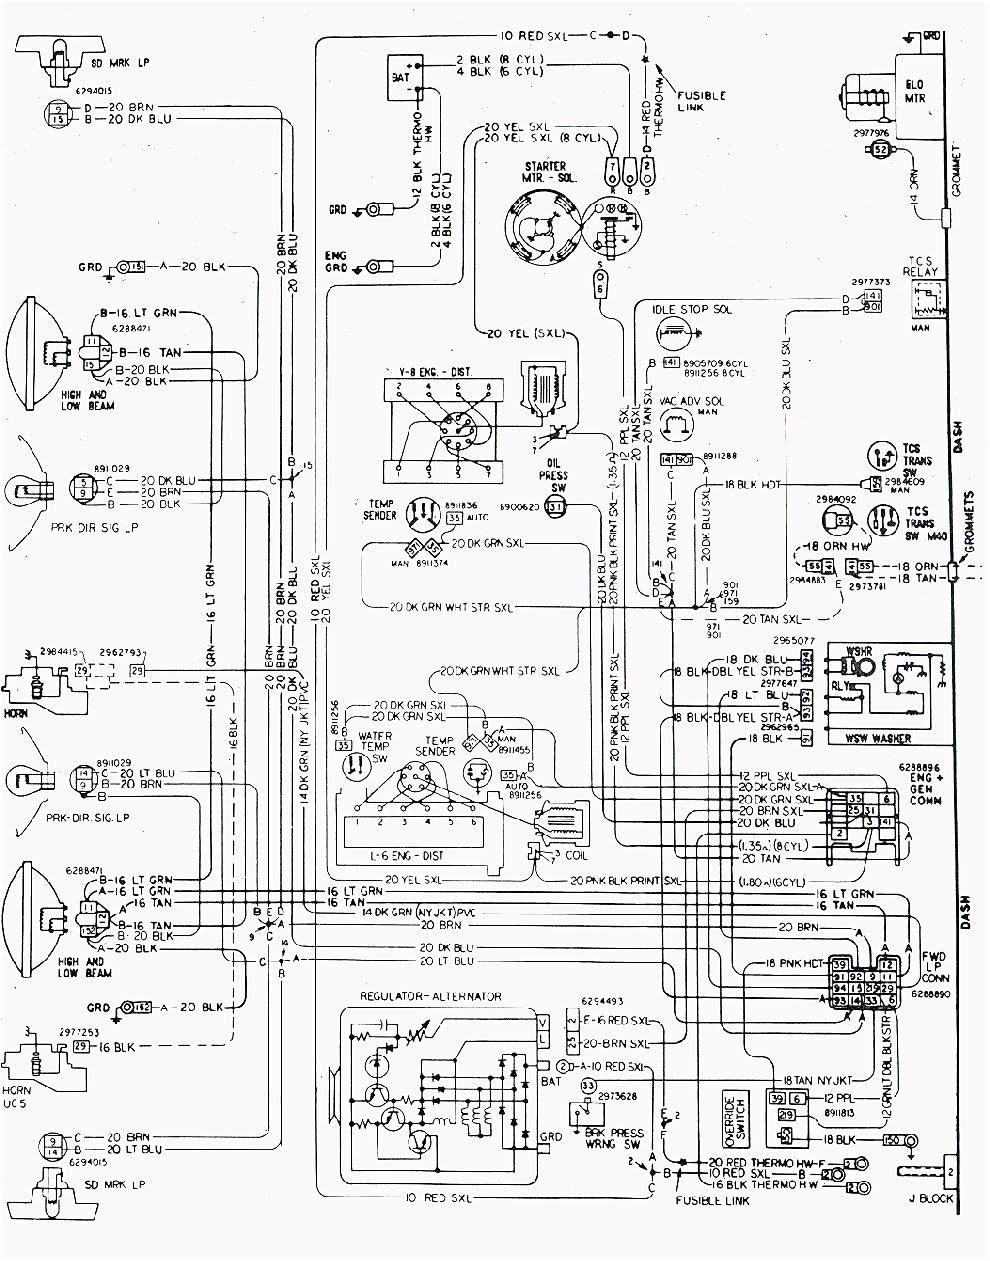 F4d3a6 1969 Camaro Turn Signal Wiring Diagram Wiring Library